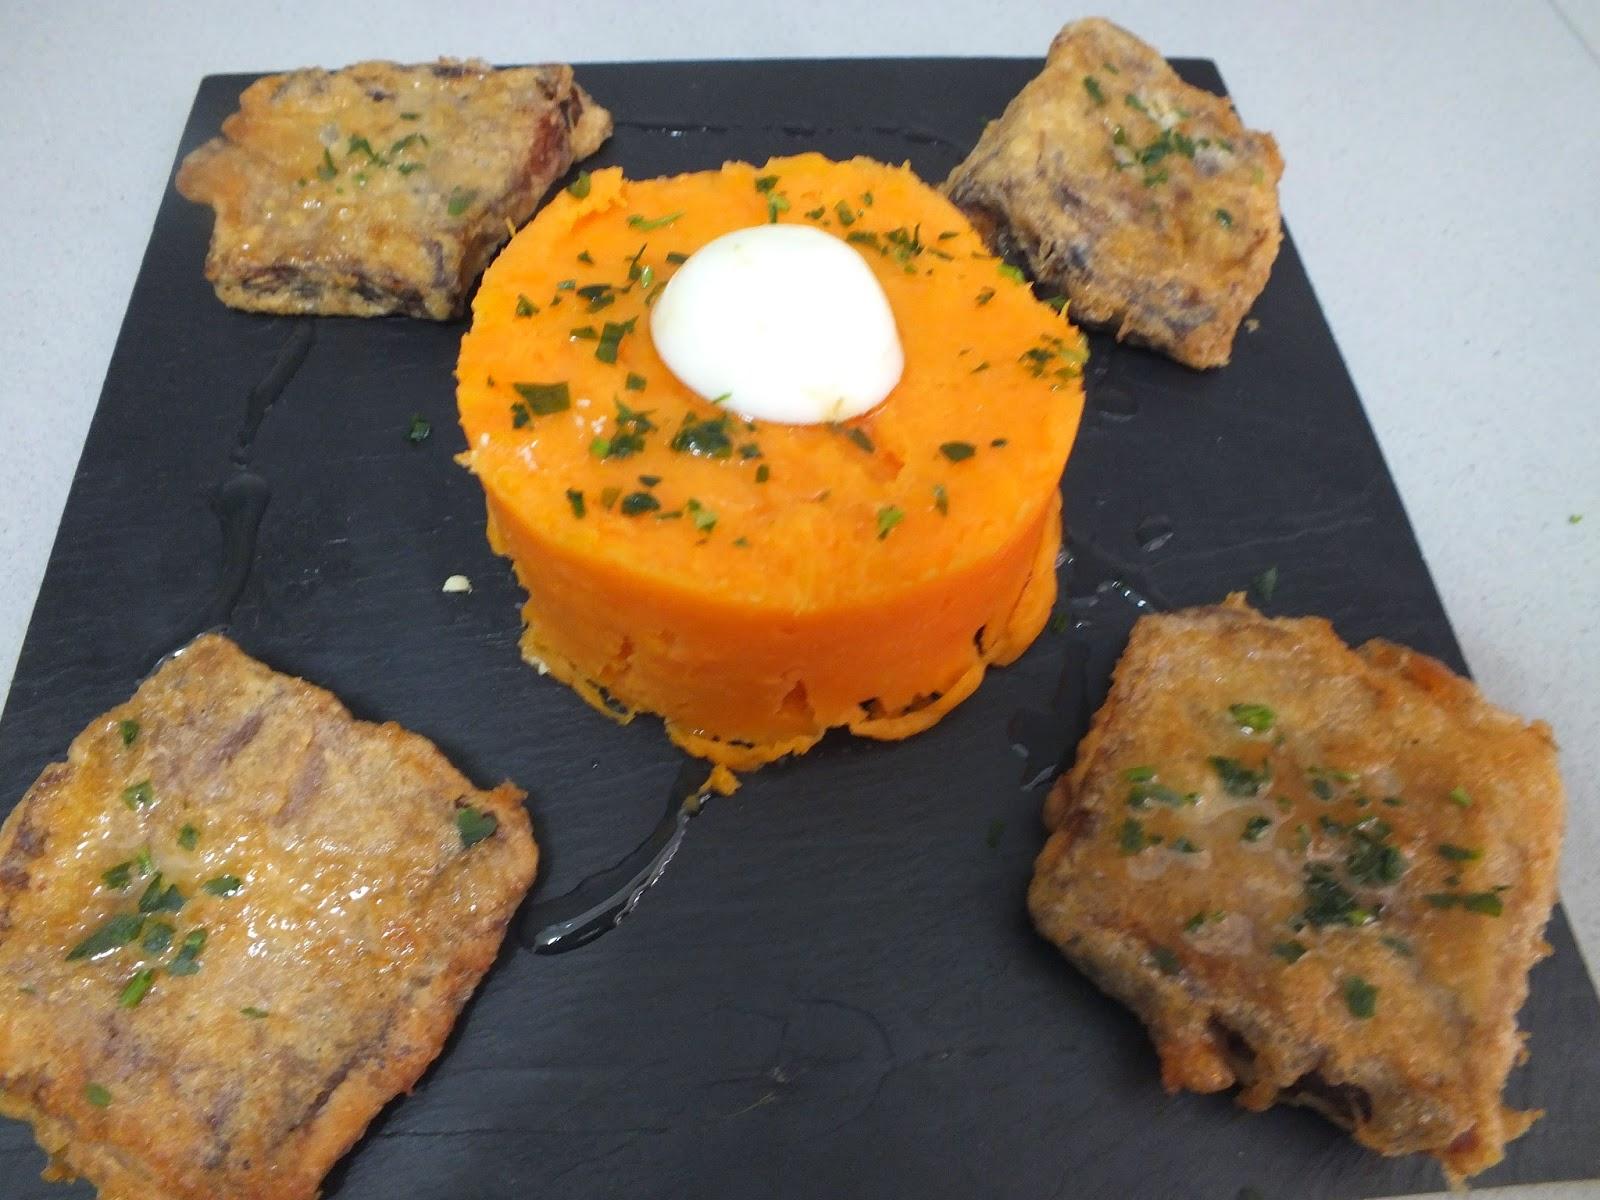 Escuela de cocina pako amor lengua de ternera frita con - Escuela de cocina paco amor ...